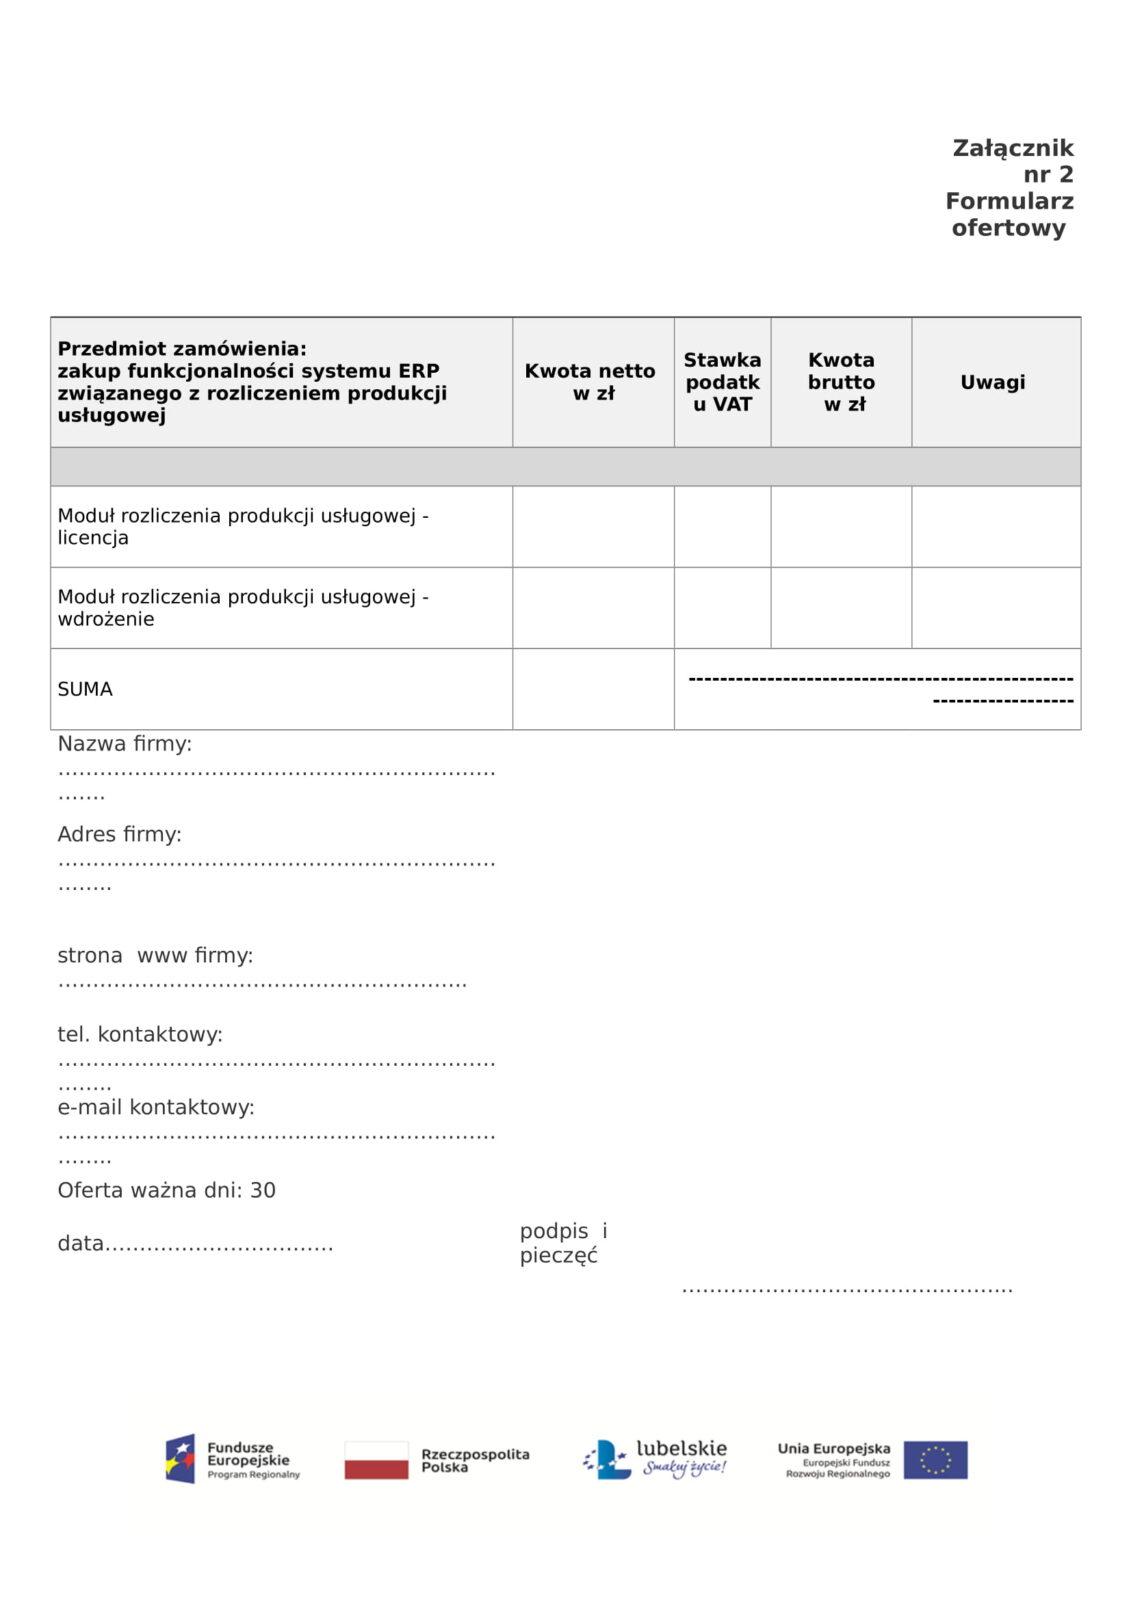 https://sofood.pl/wp-content/uploads/2021/01/Zalacznik-nr-2-Formularz-ofertowy-13.01.20-2.pdf